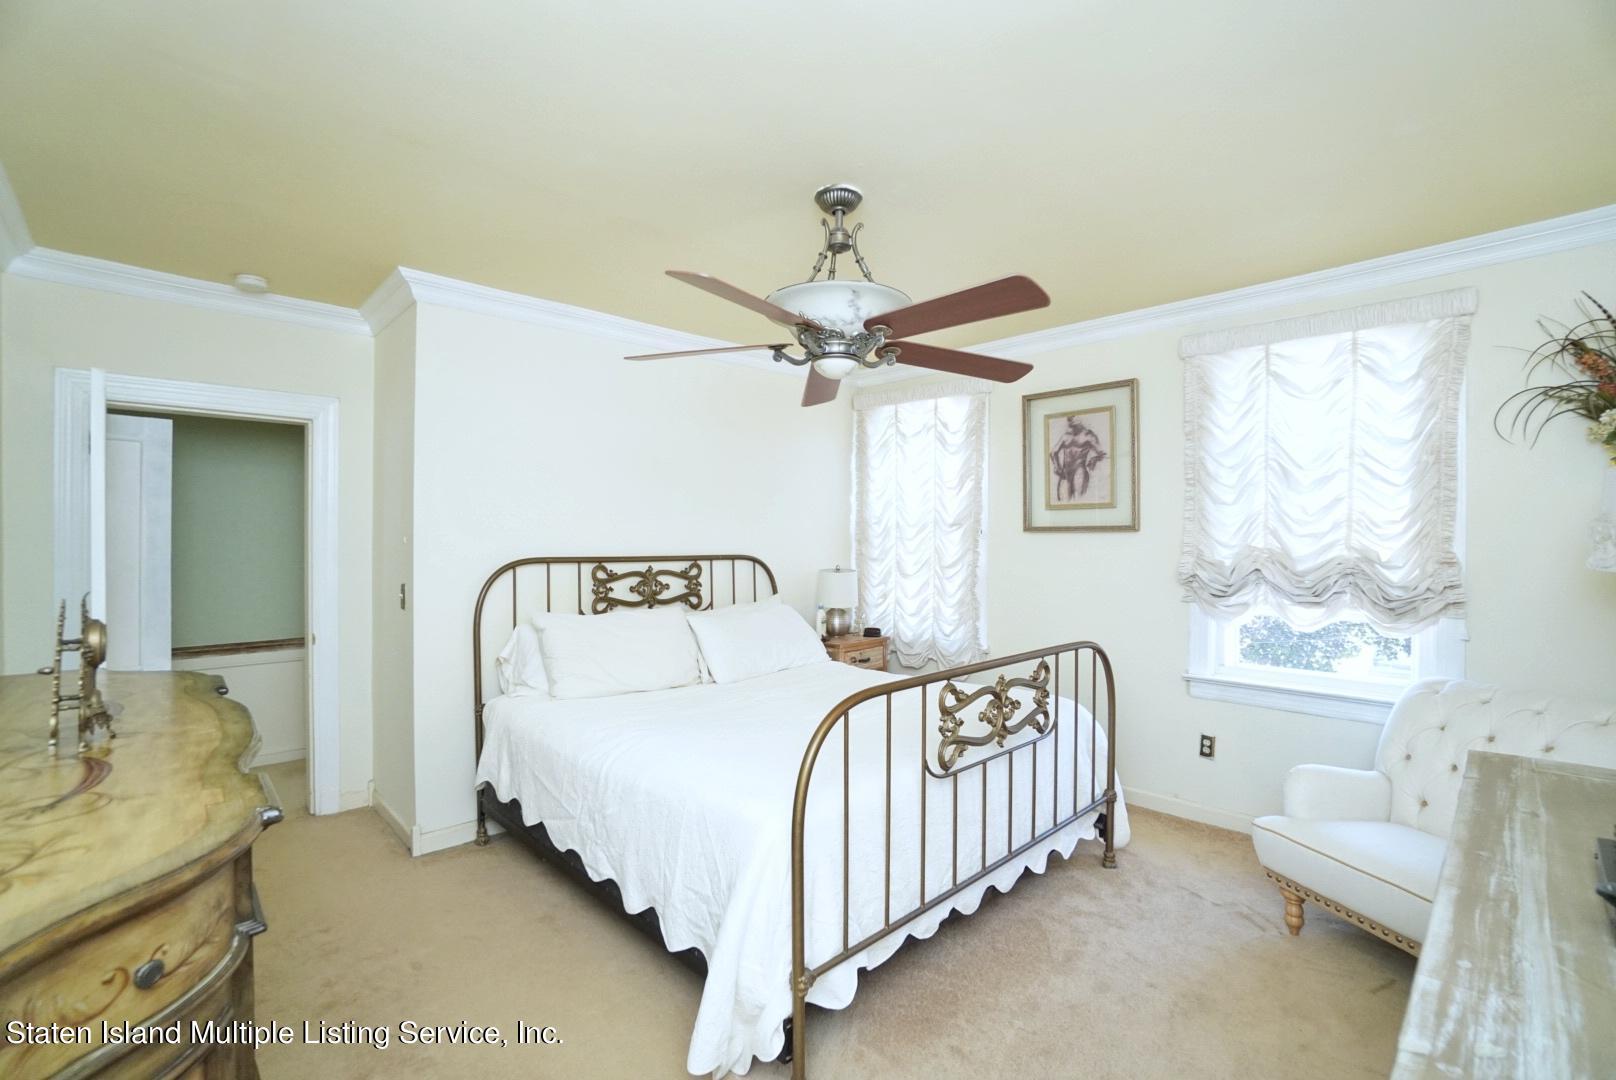 Single Family - Detached 264 Fisher Avenue  Staten Island, NY 10307, MLS-1146898-31